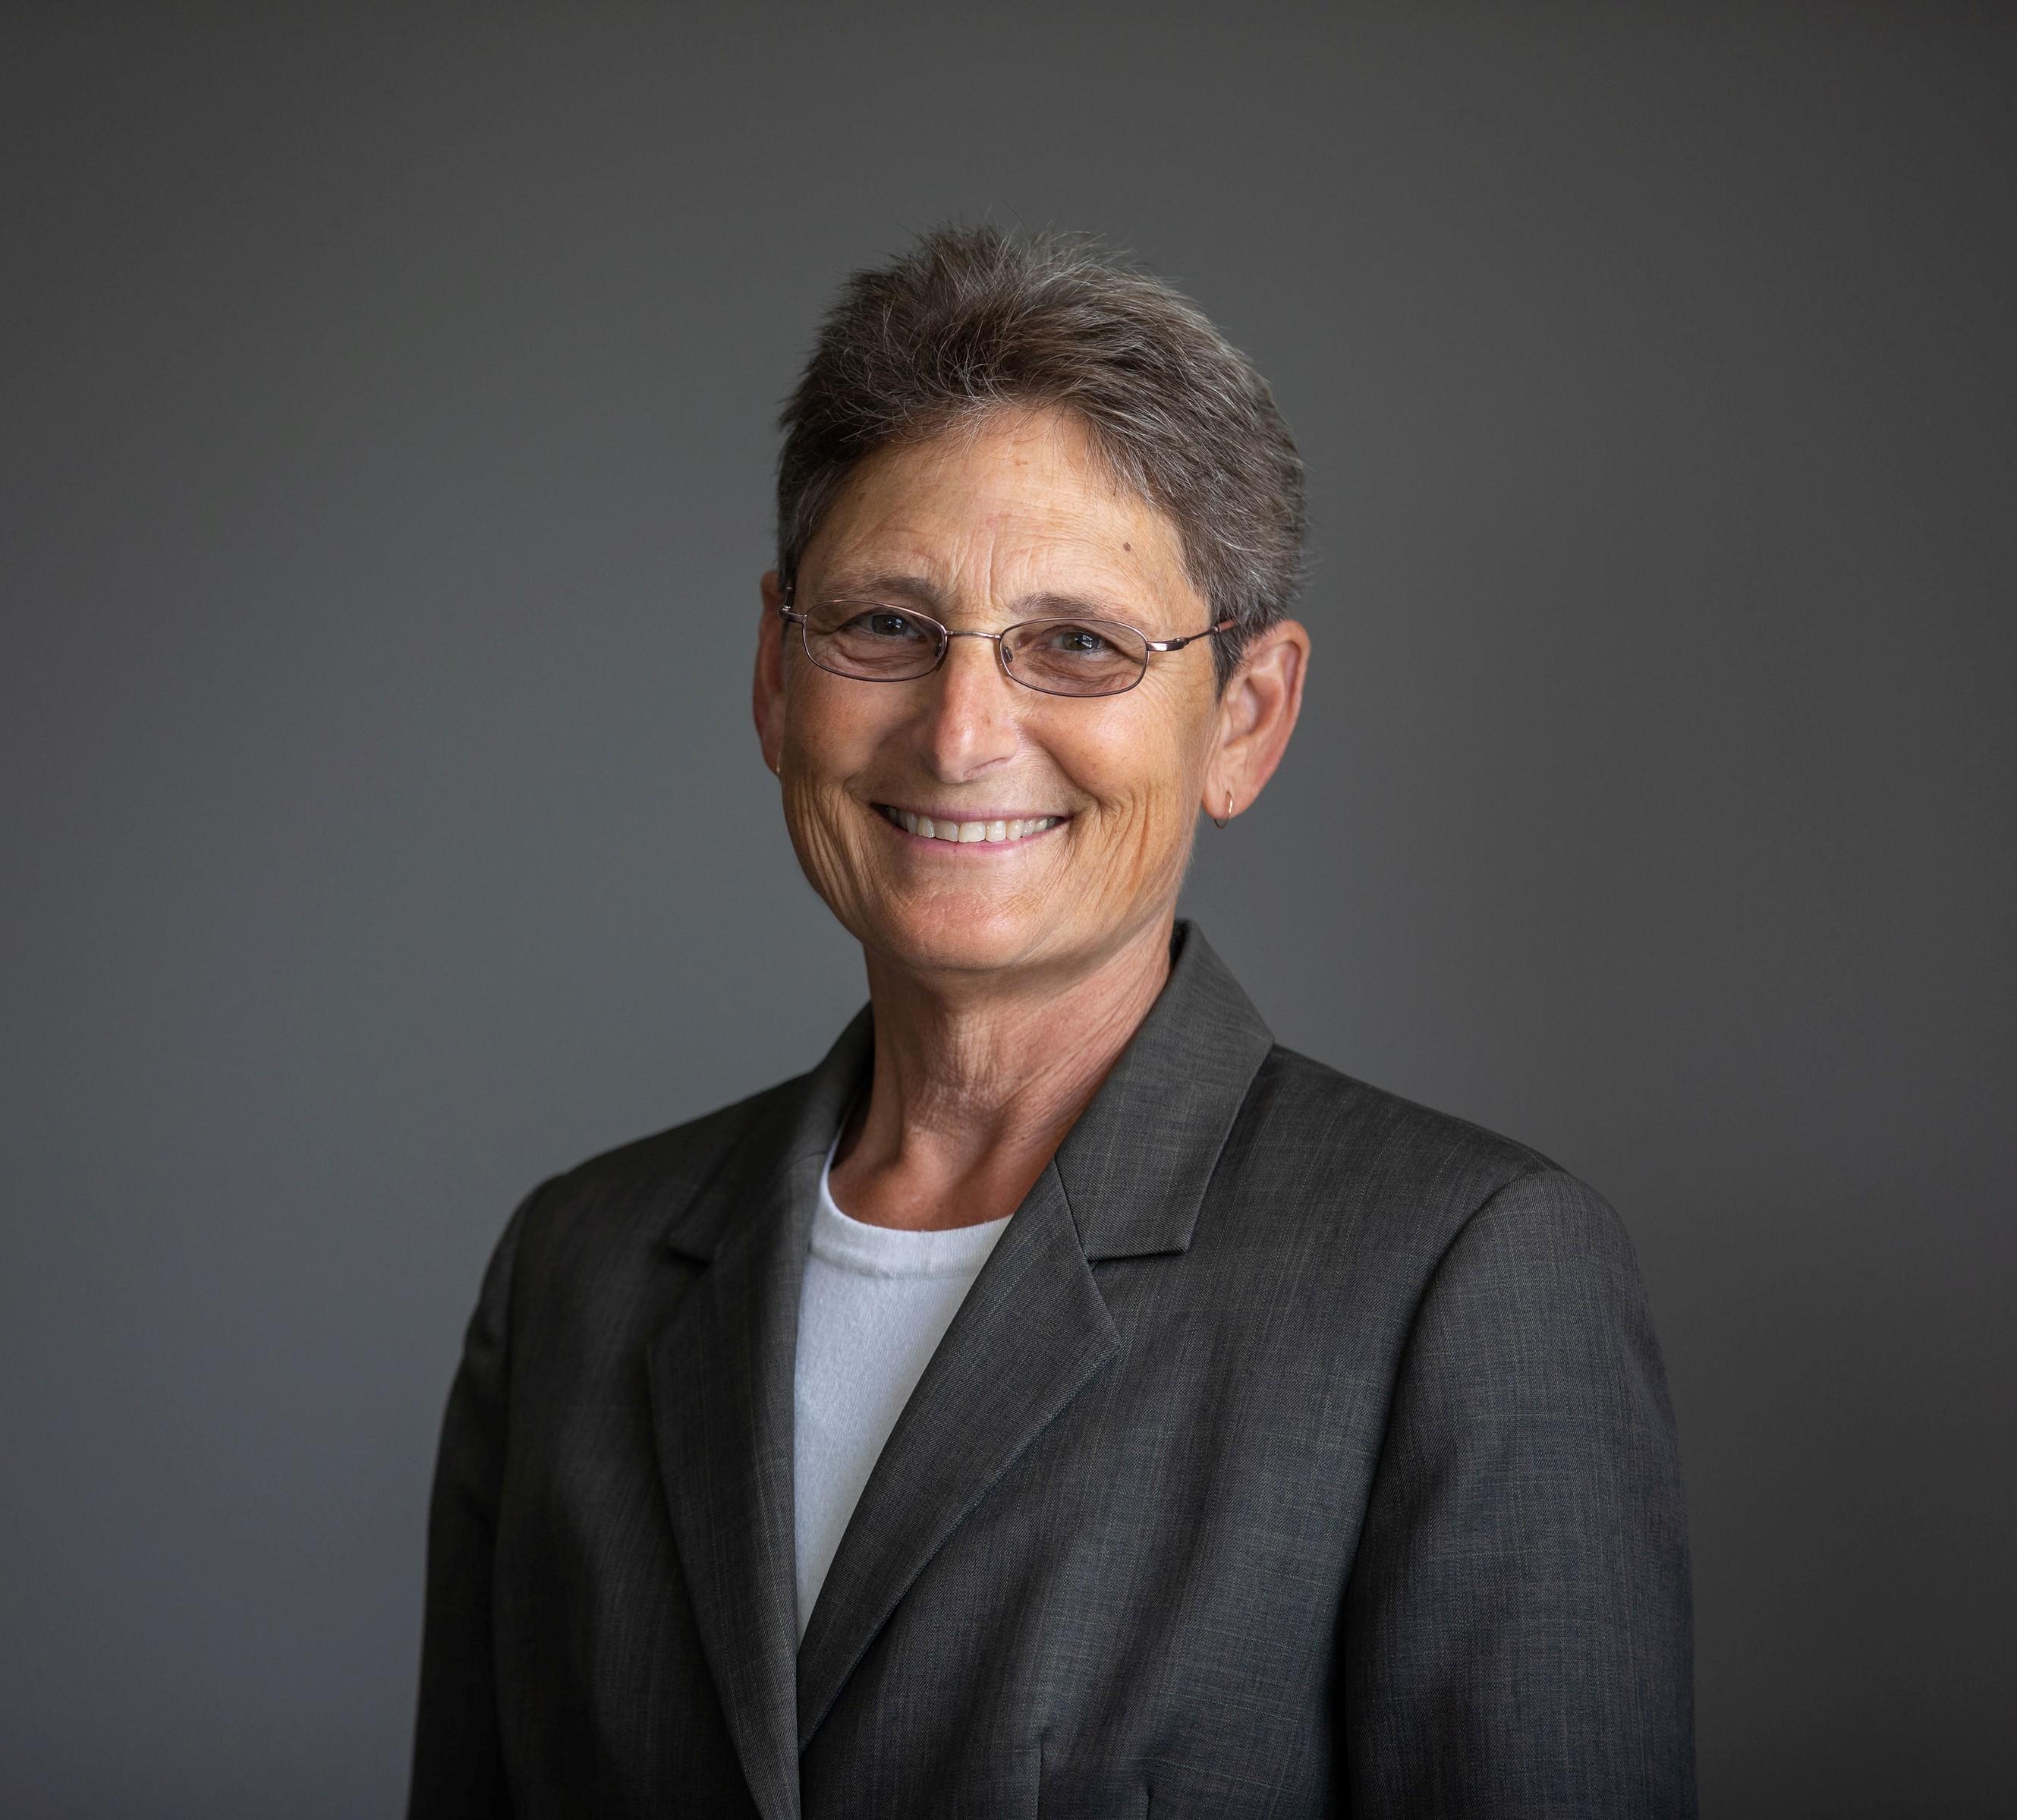 Smiling portrait of Ruth Siegfried against dark grey background